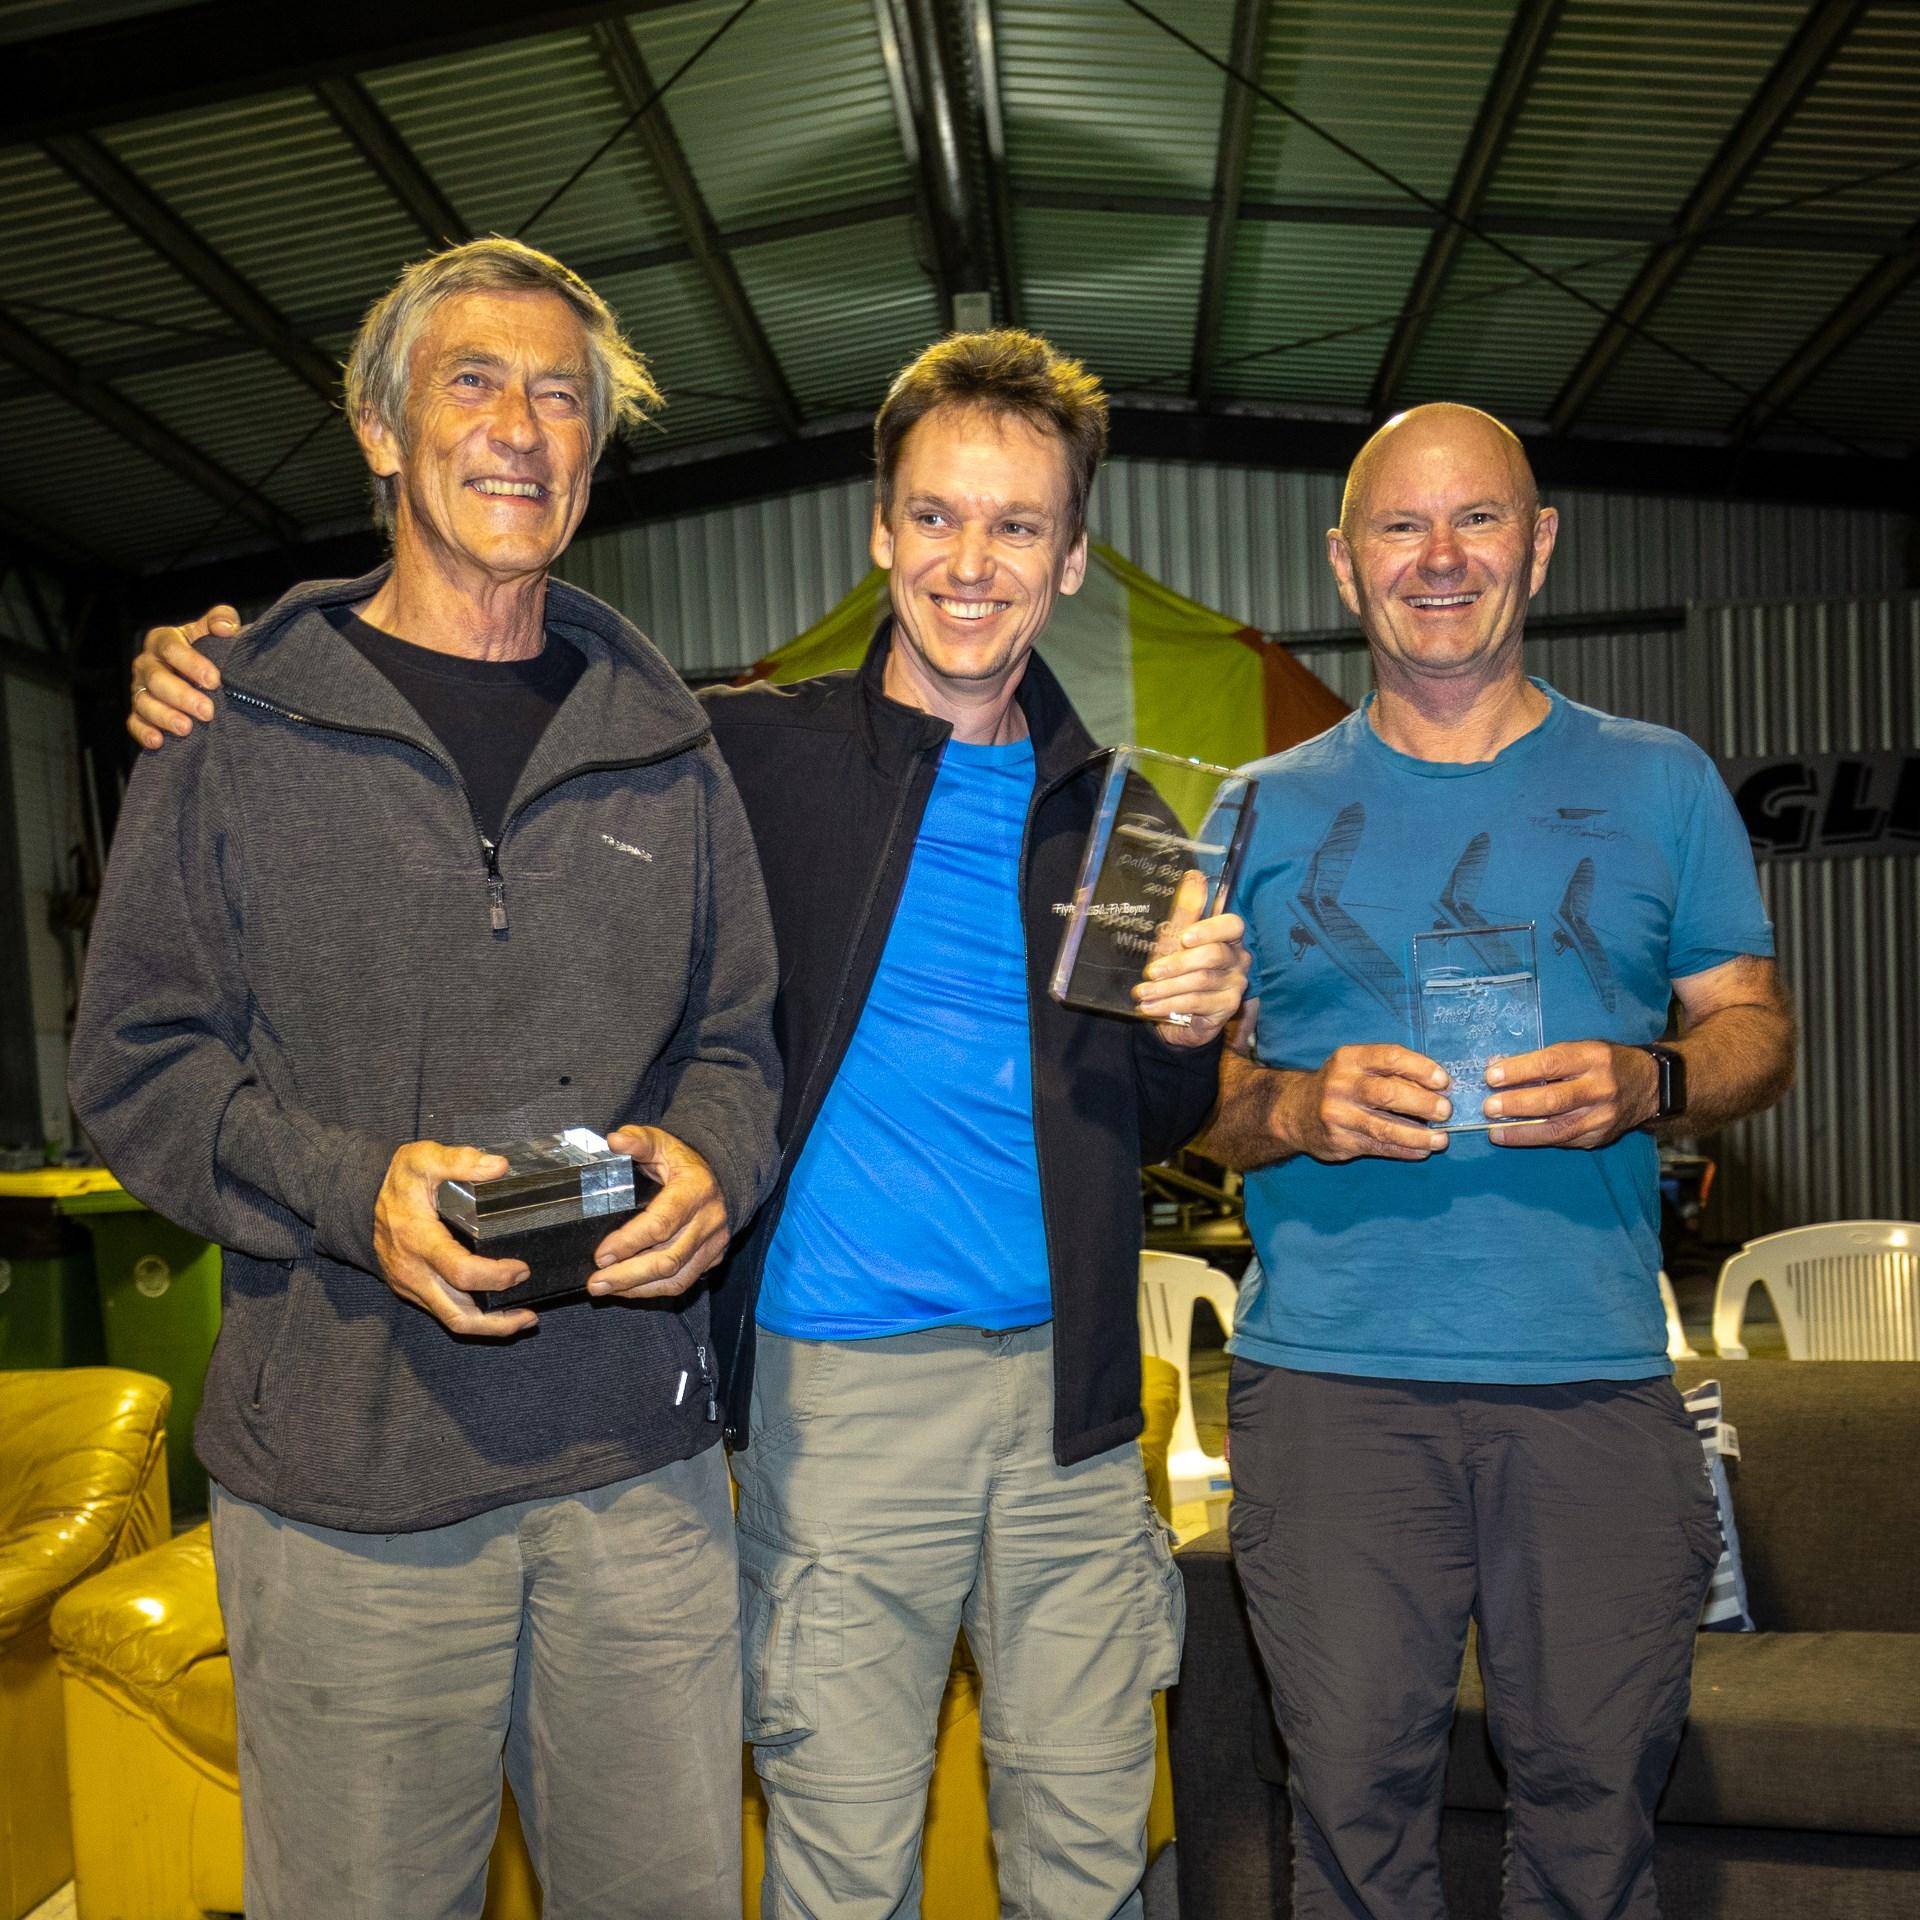 Alastair, Andrey and Hugh at the award ceremony ~ Аластэир, Андрей и Хью на церемонии награждения